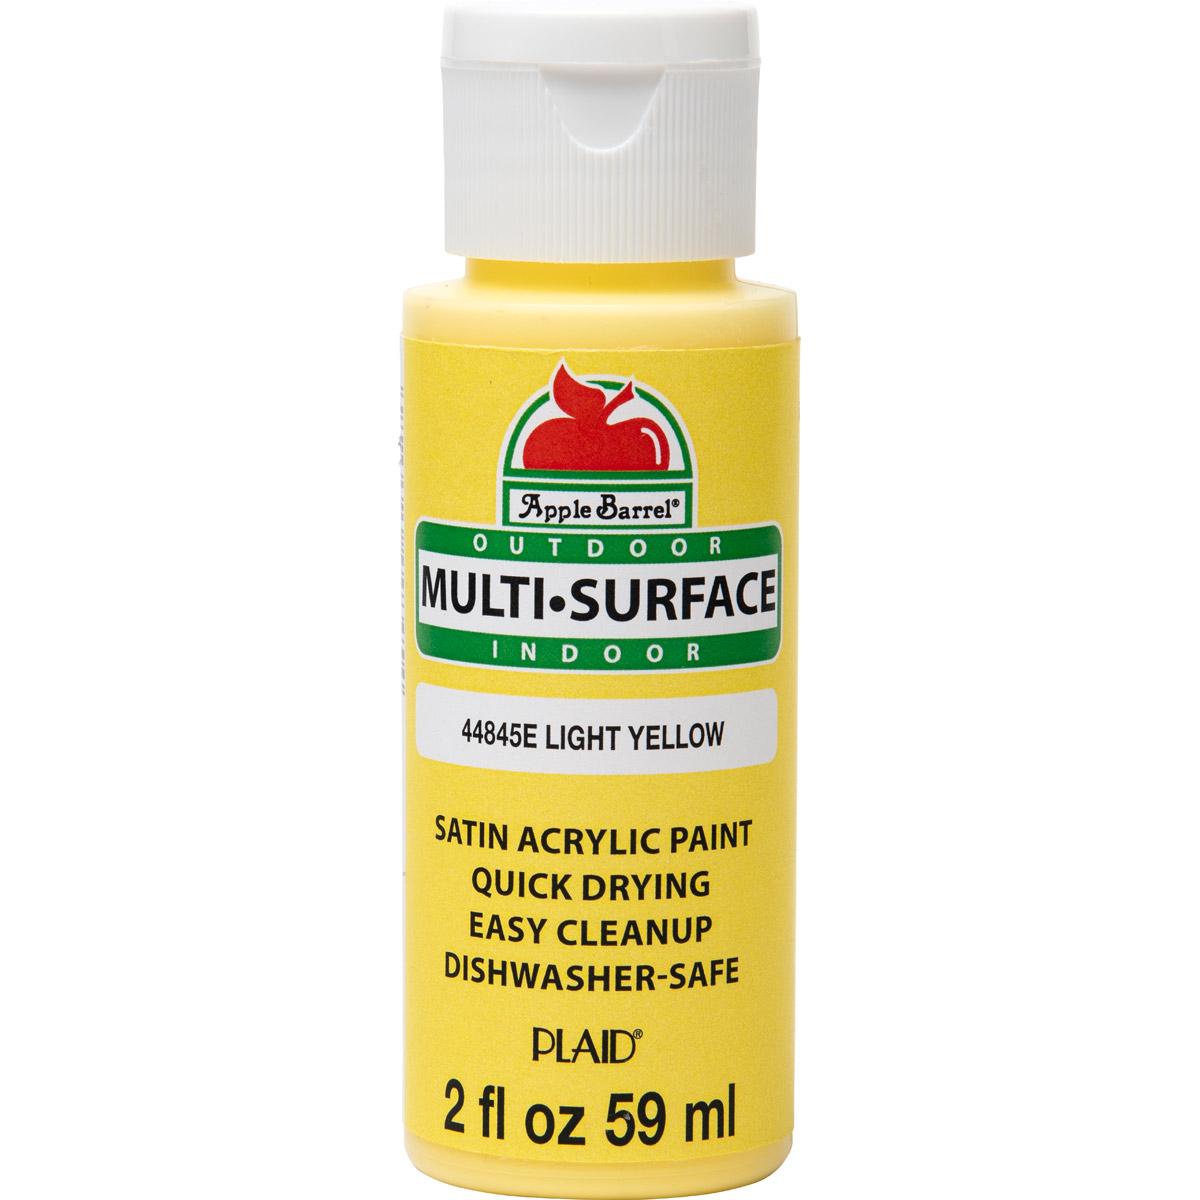 Apple Barrel ® Multi-Surface Satin Acrylic Paints - Light Yellow, 2 oz.